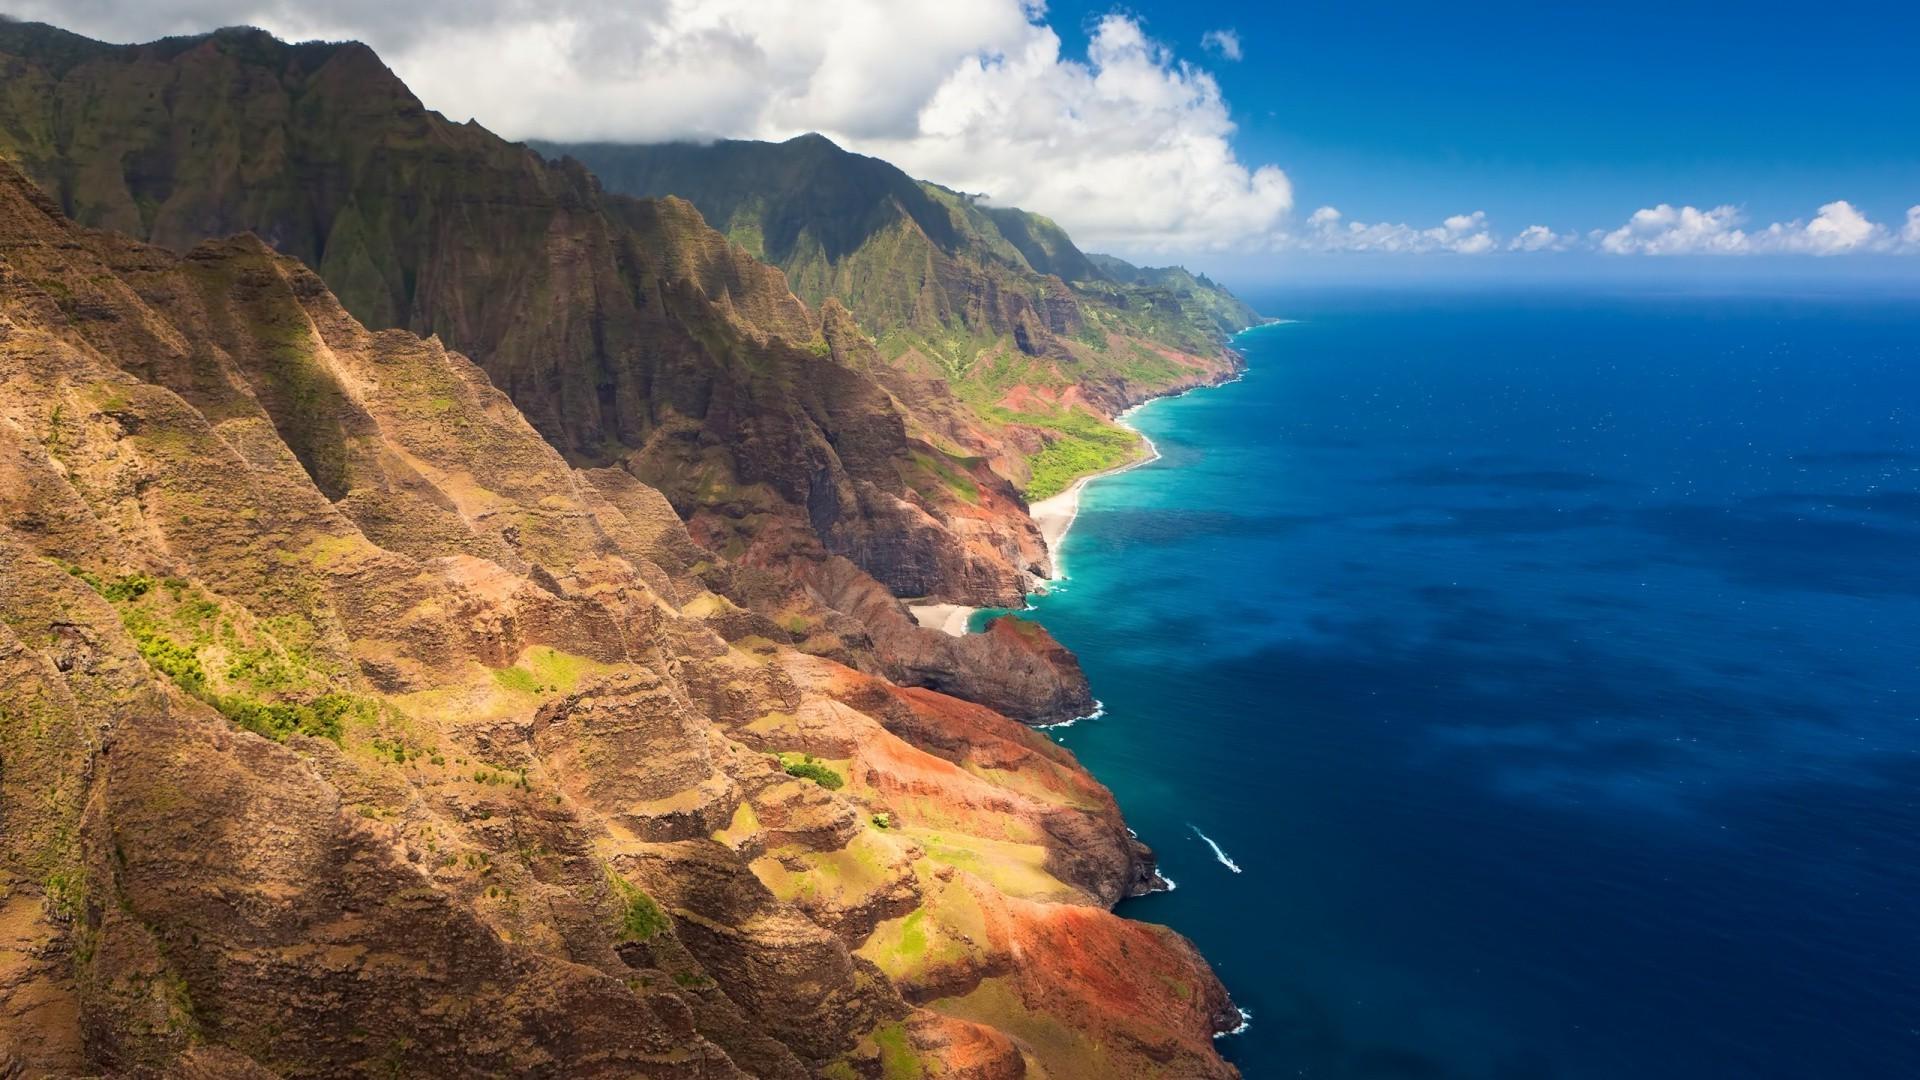 landscape, Na Pali Coast, Coast, Sea, Hawaii Wallpapers HD .